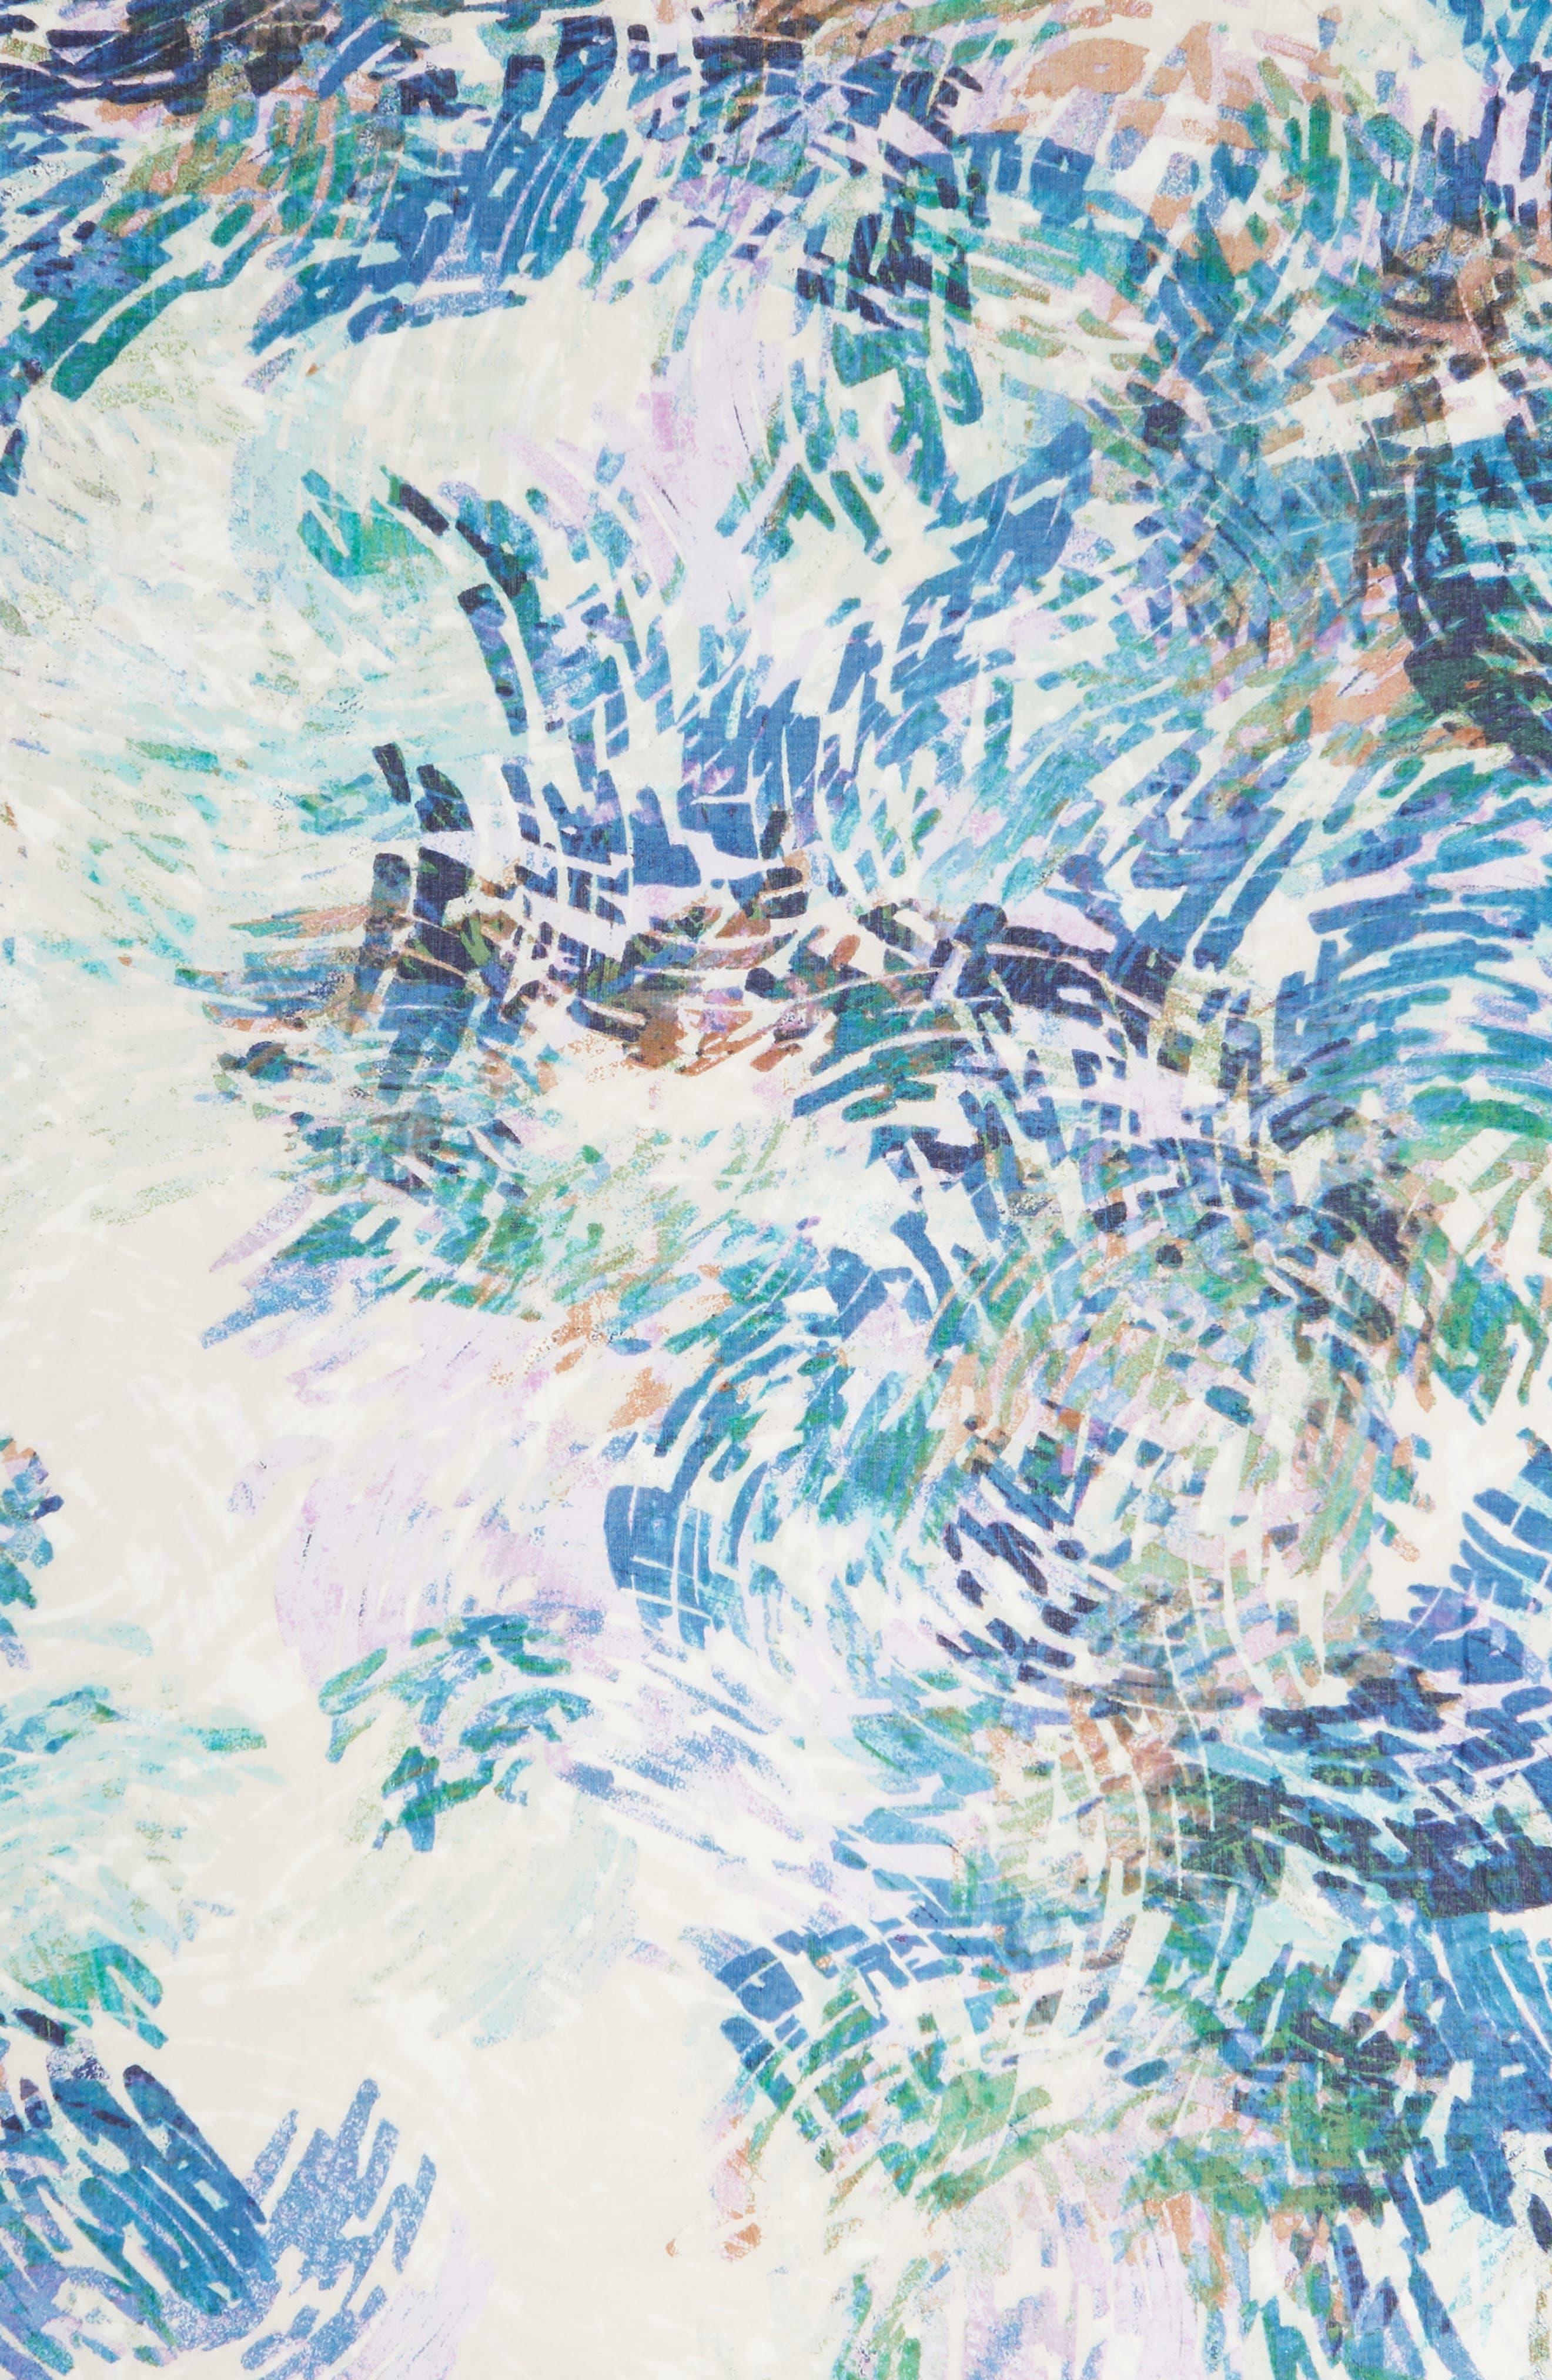 Eyelash Trim Print Cashmere & Silk Wrap,                             Alternate thumbnail 4, color,                             BLUE WATER WASH